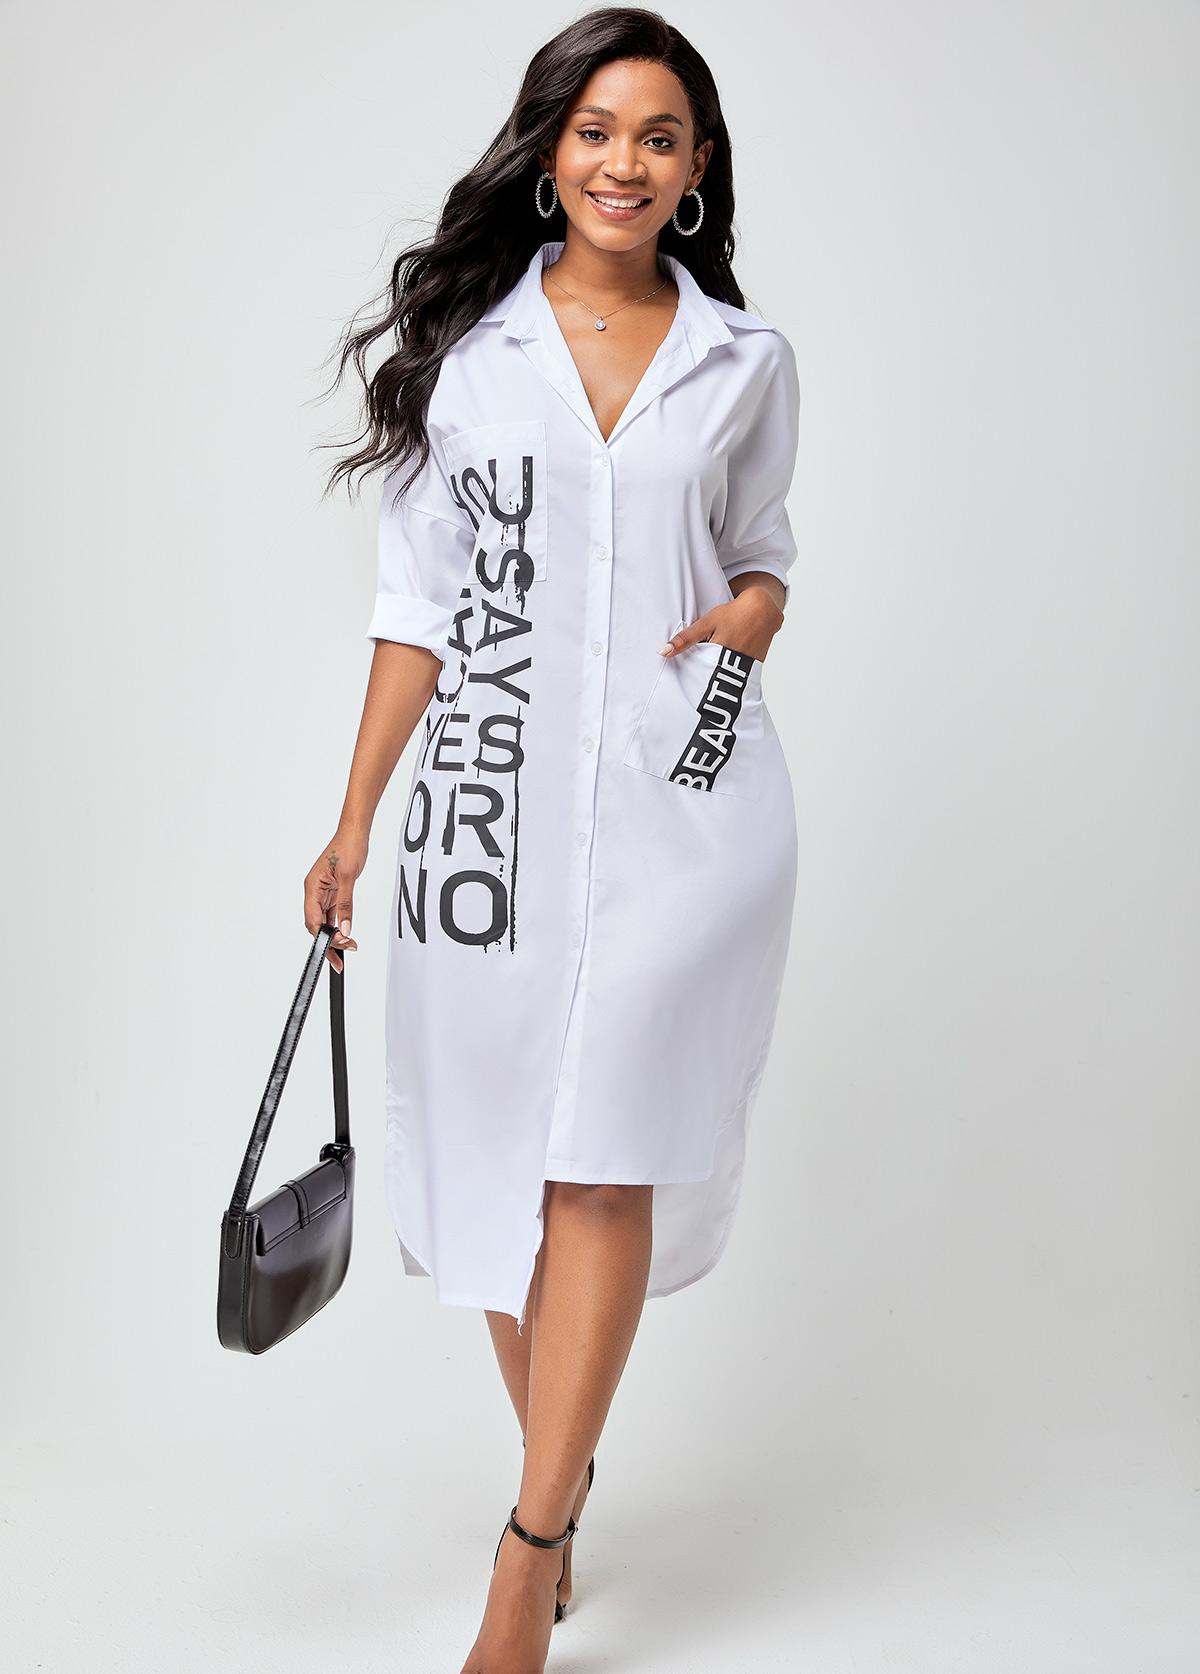 Notch Collar Letter Print Pocket Dress